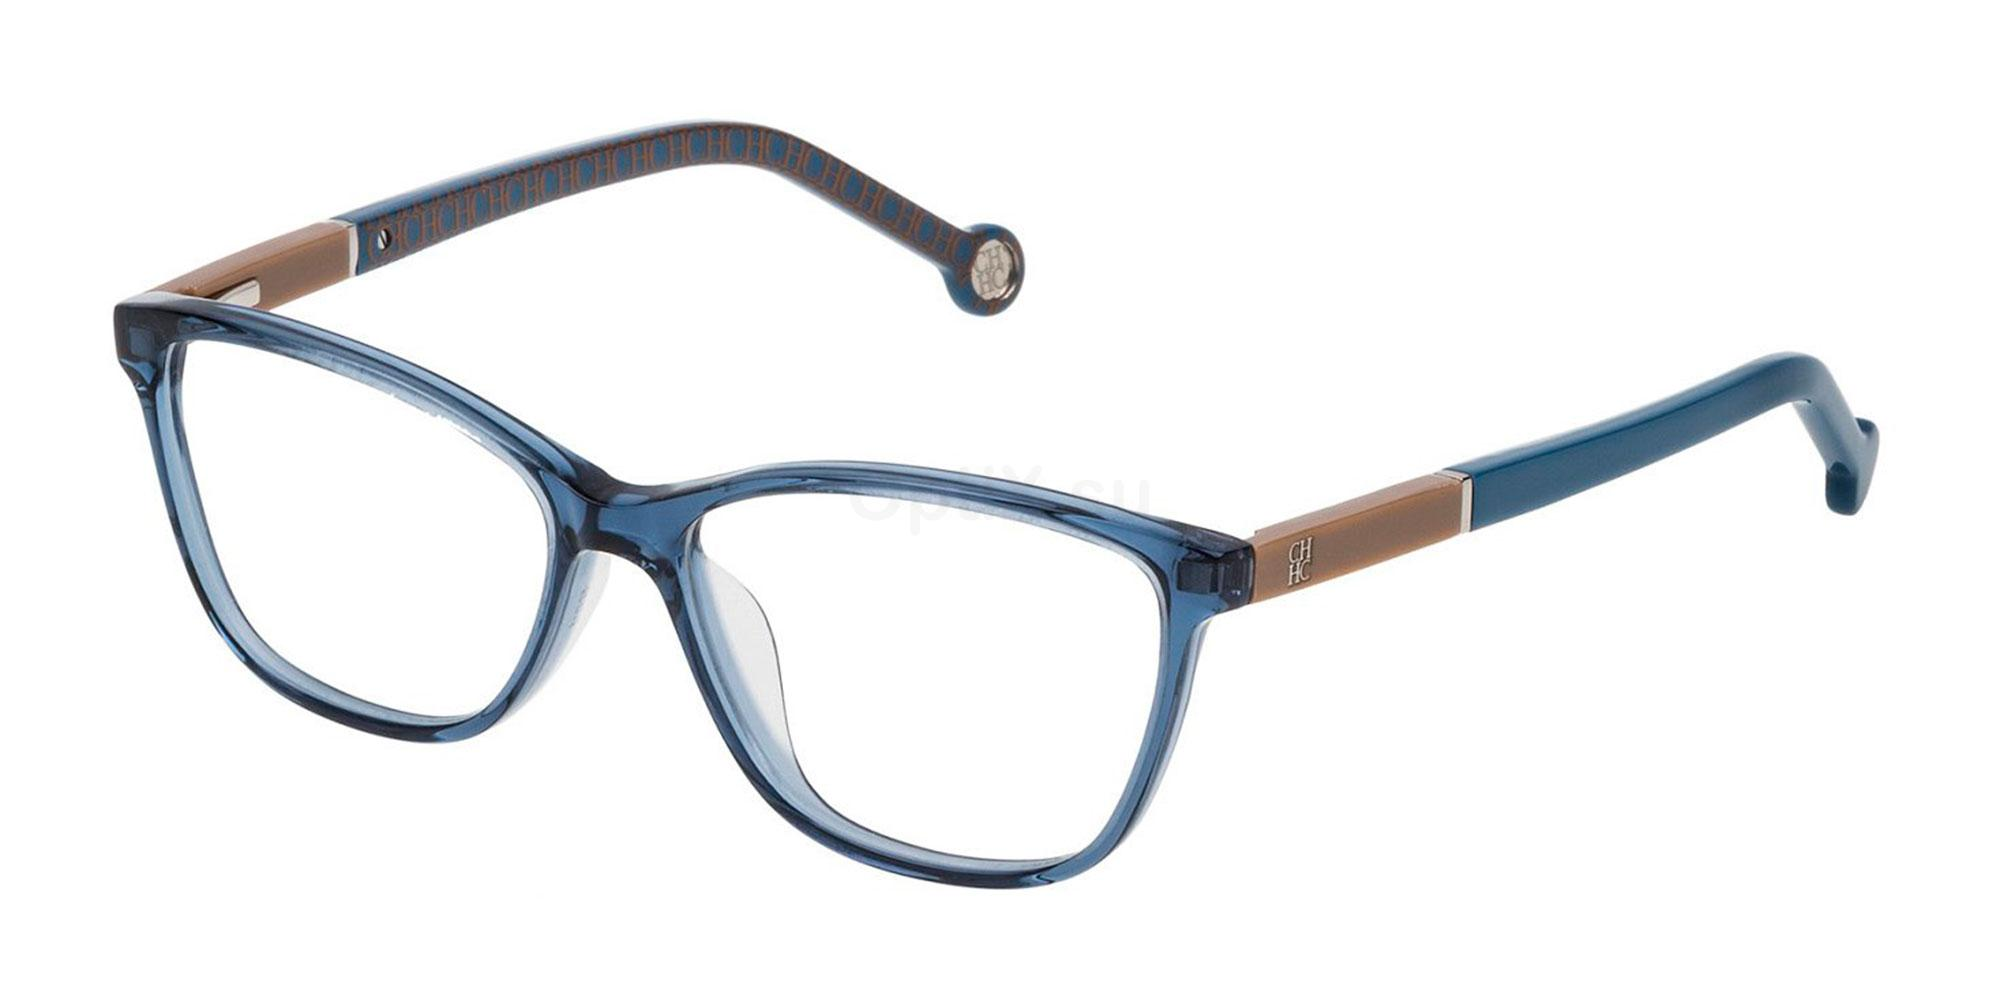 0T31 VHE712 Glasses, CH Carolina Herrera